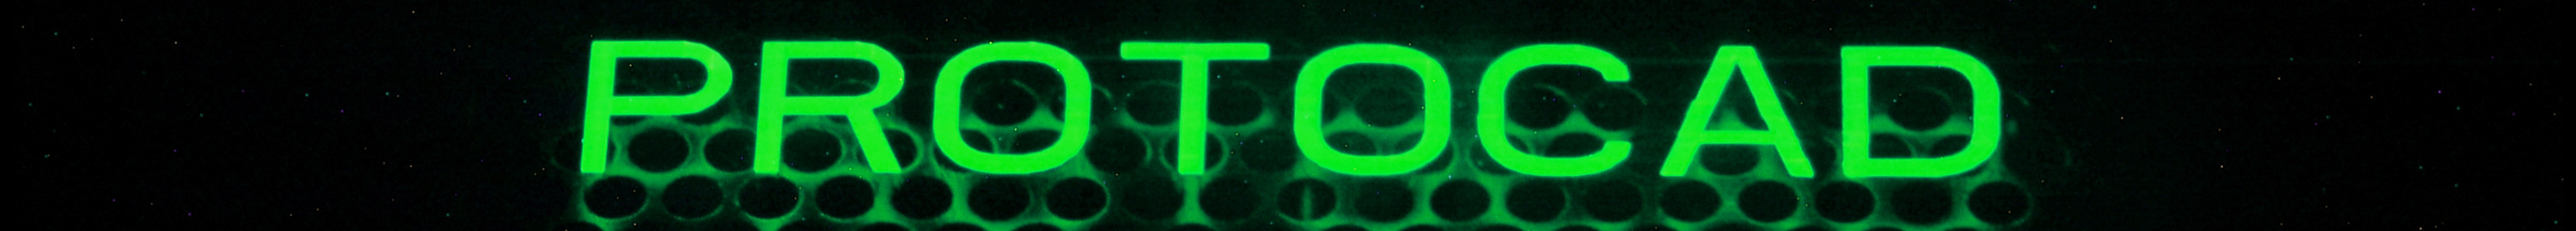 protoCAD Laser Heading